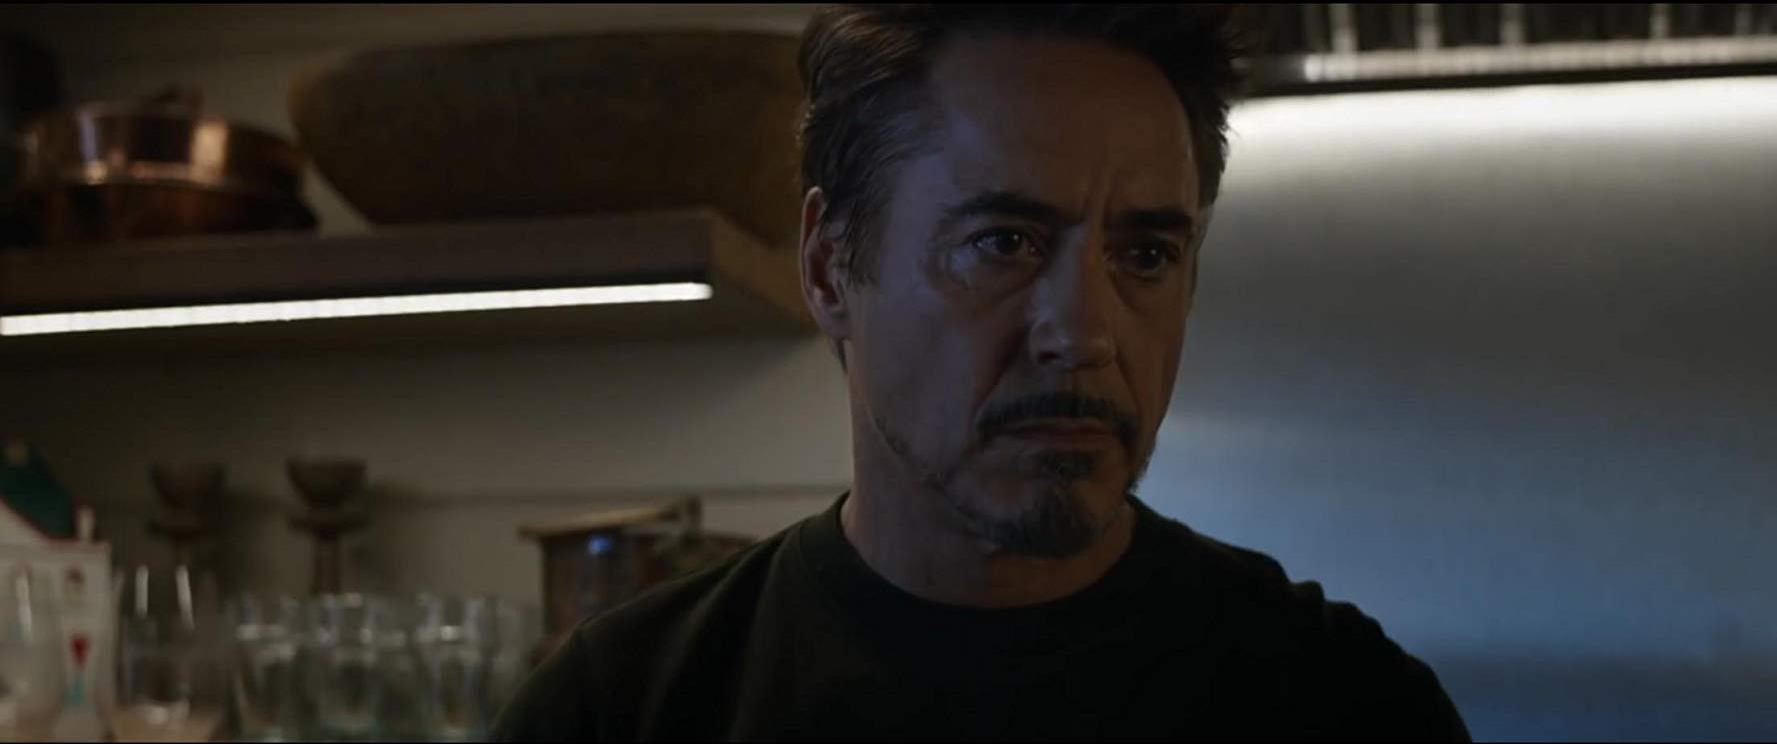 Avengers: Endgame, un primo piano di Robert Downey Jr.